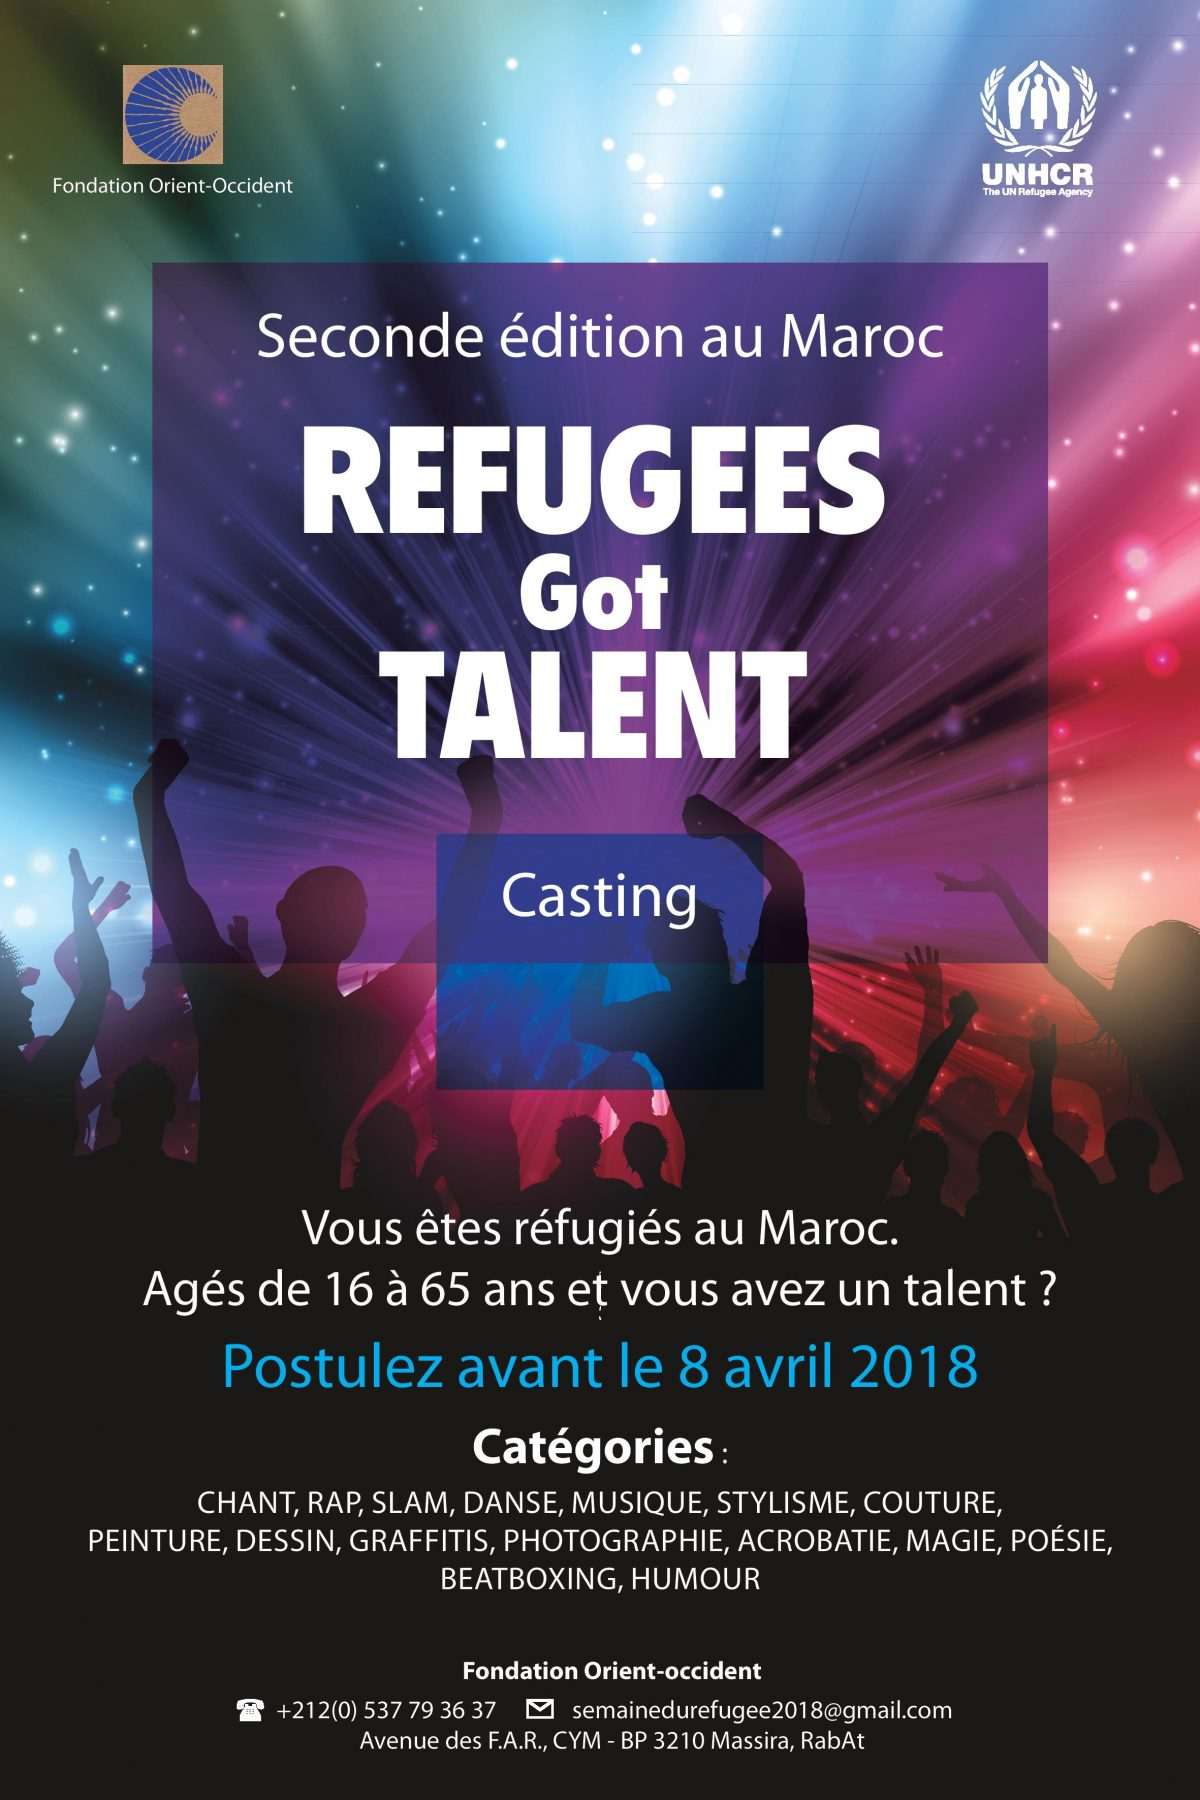 Refugees Got Talent – Casting